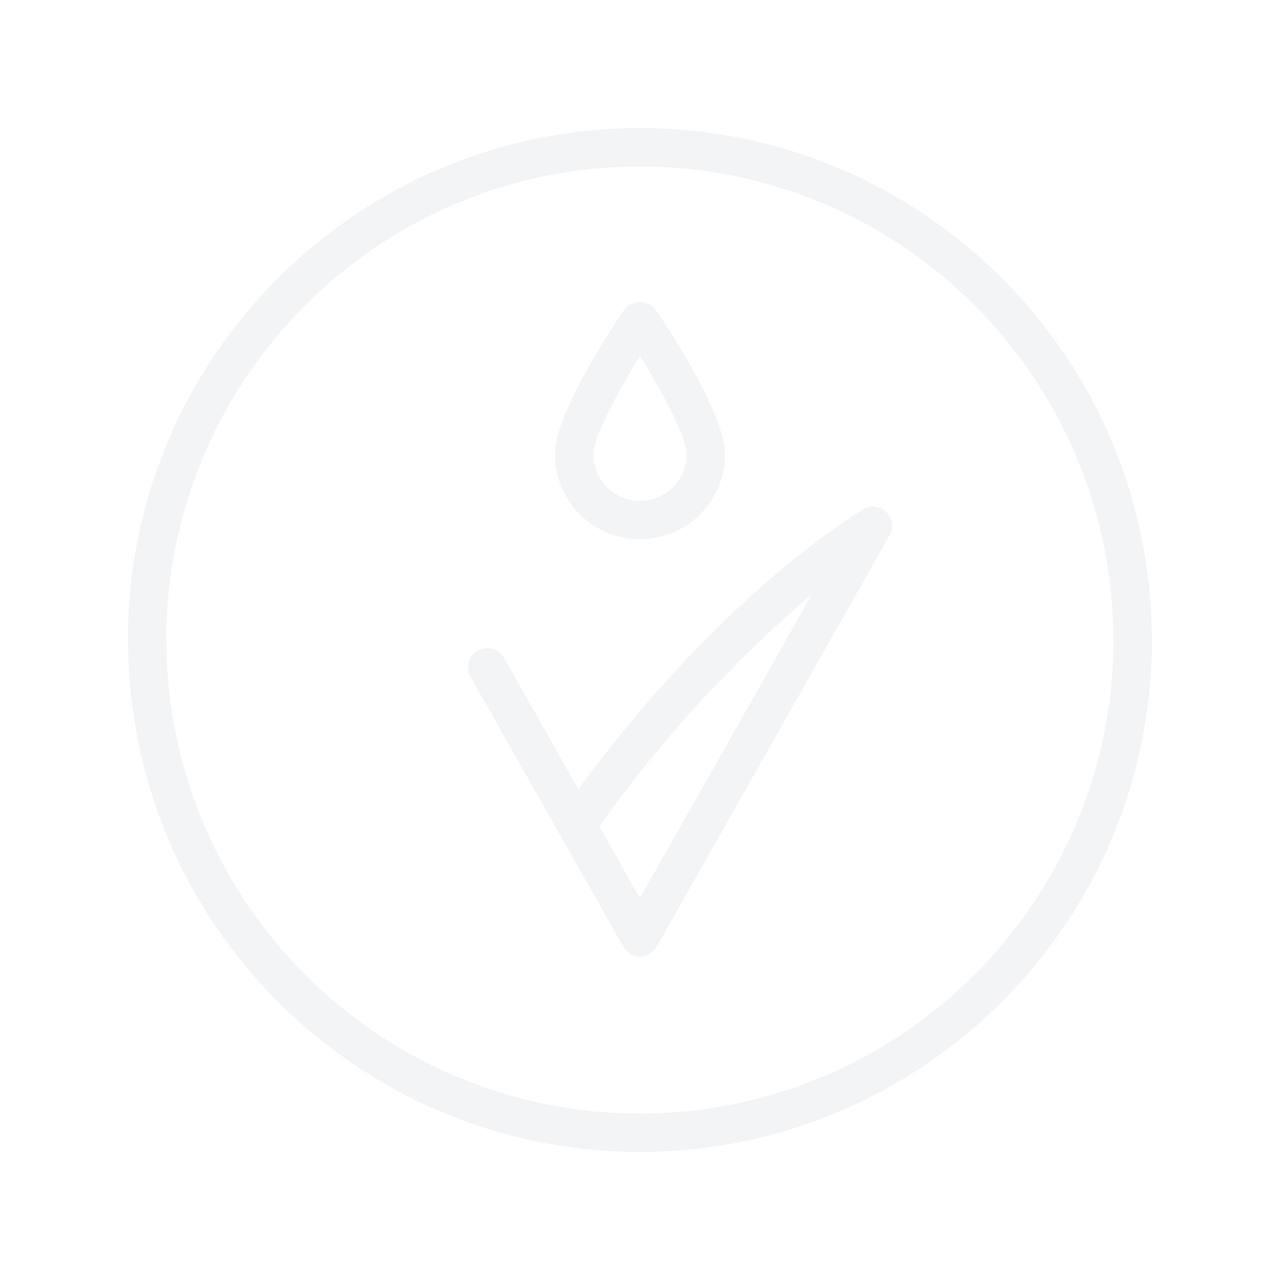 TAHE Lumiere Mask 300ml